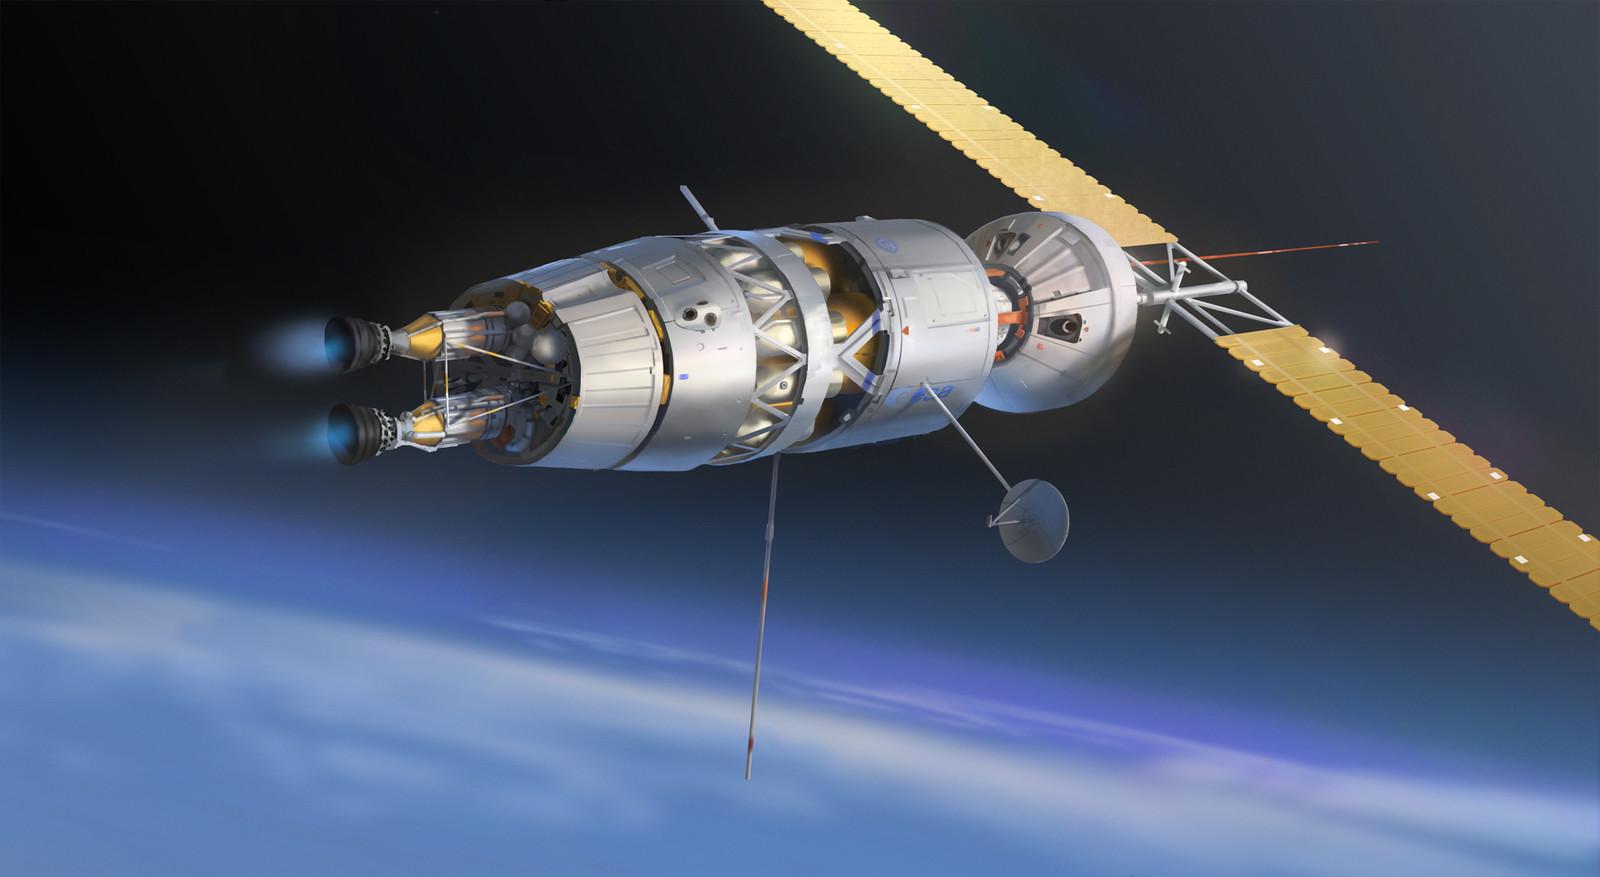 Nuclear Engine Spaceship - Mars Express